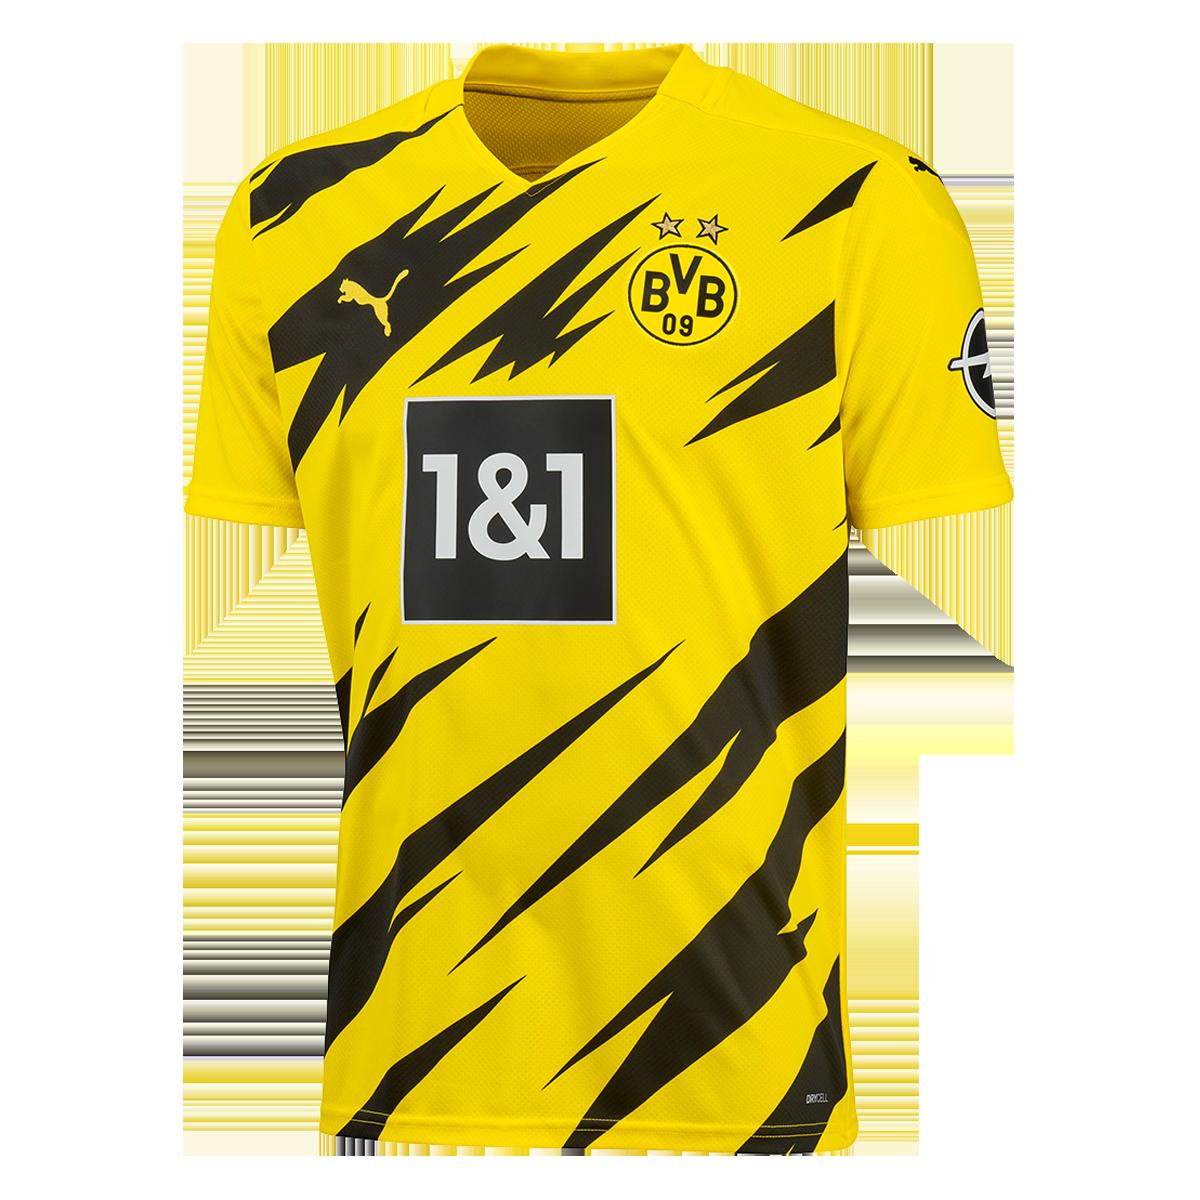 Puma Bvb Herren Heim Trikot 2020 21 Gelb Schwarz Fussball Shop